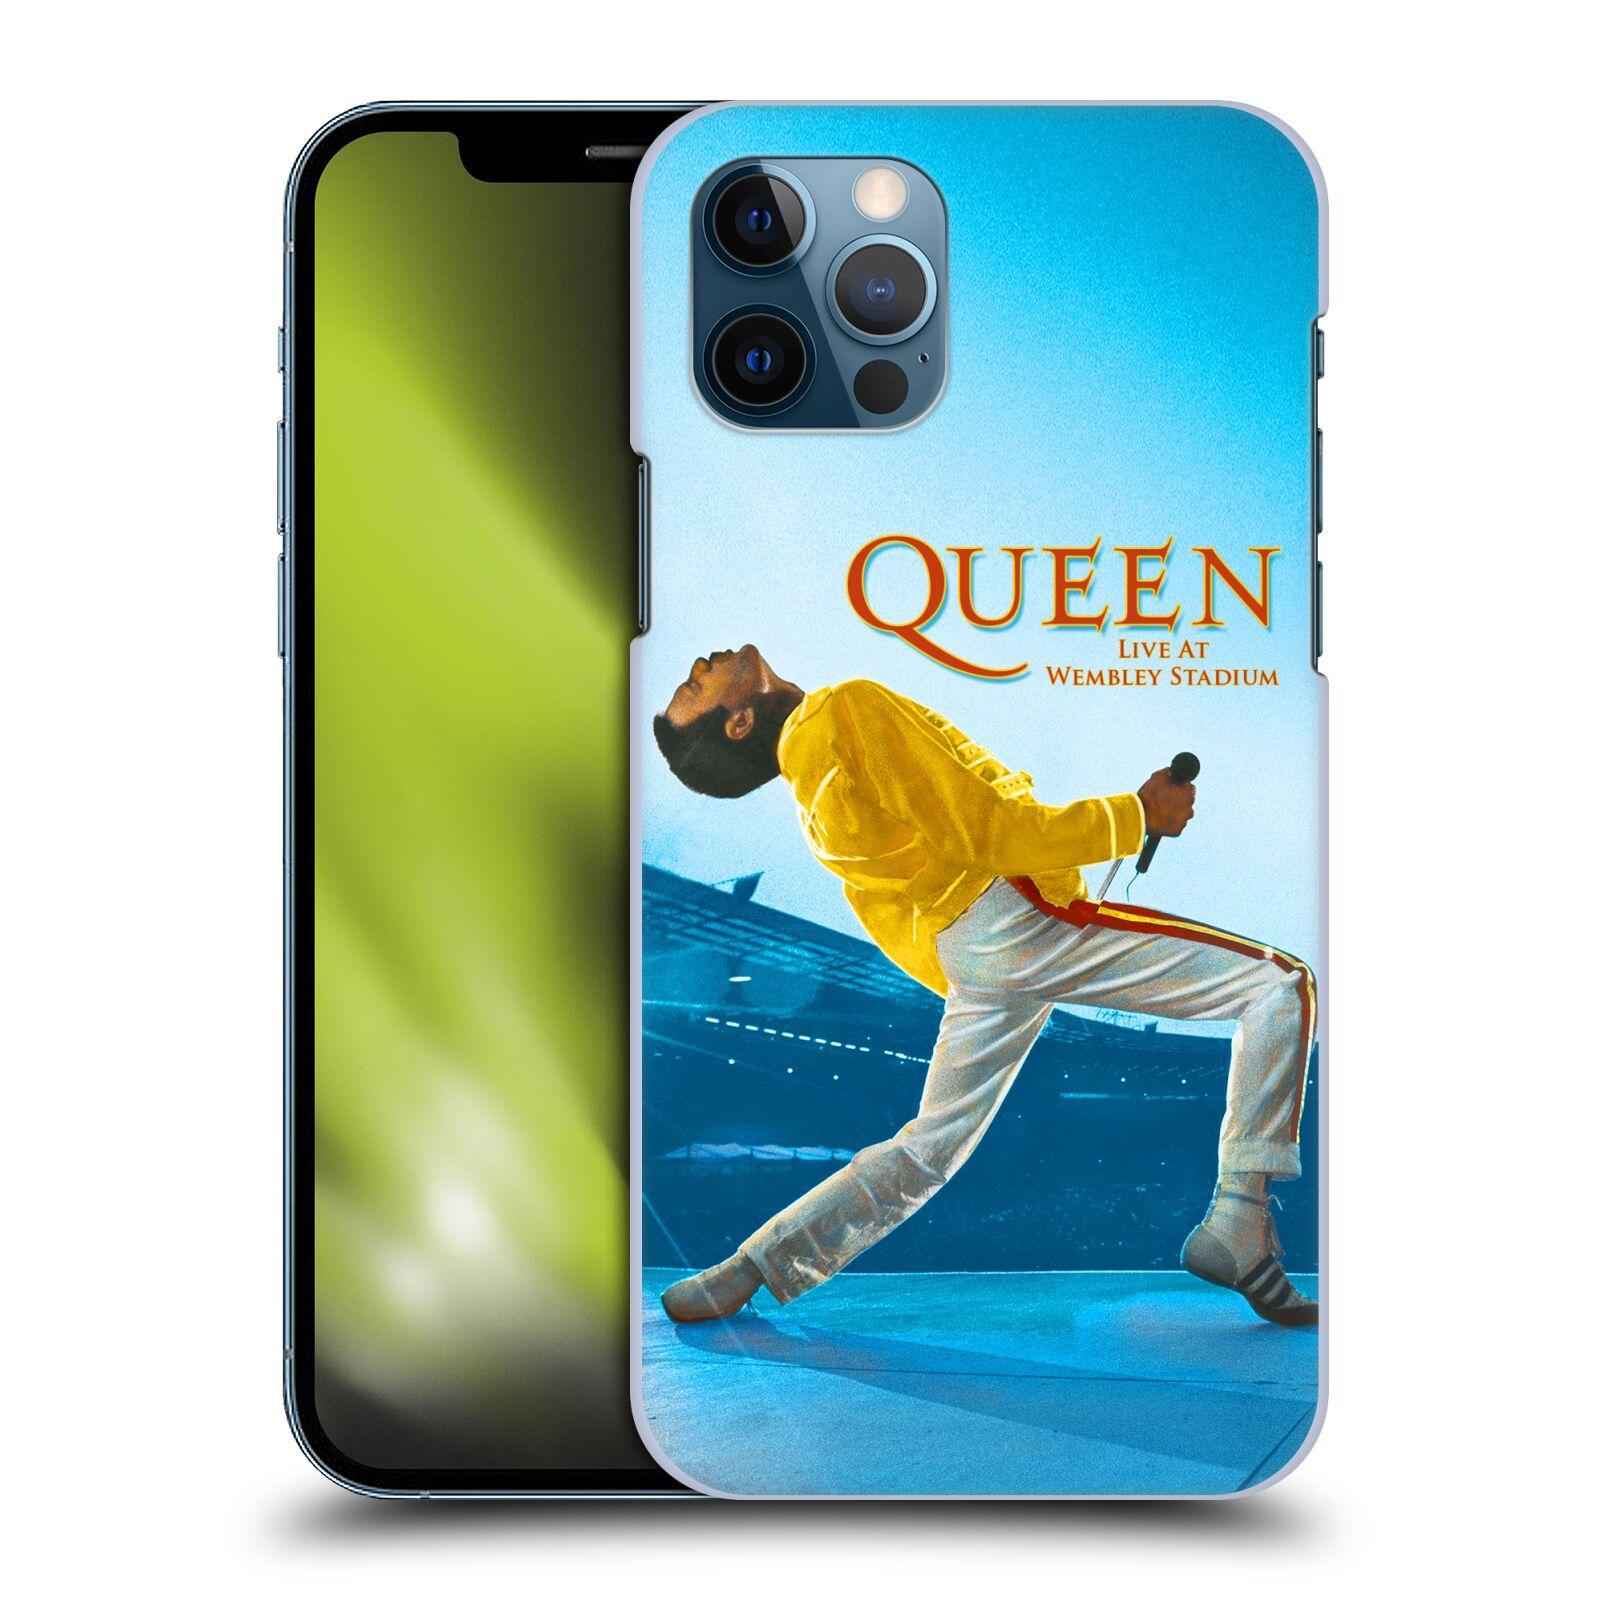 Plastové pouzdro na mobil Apple iPhone 12 / 12 Pro - Head Case - Queen - Freddie Mercury